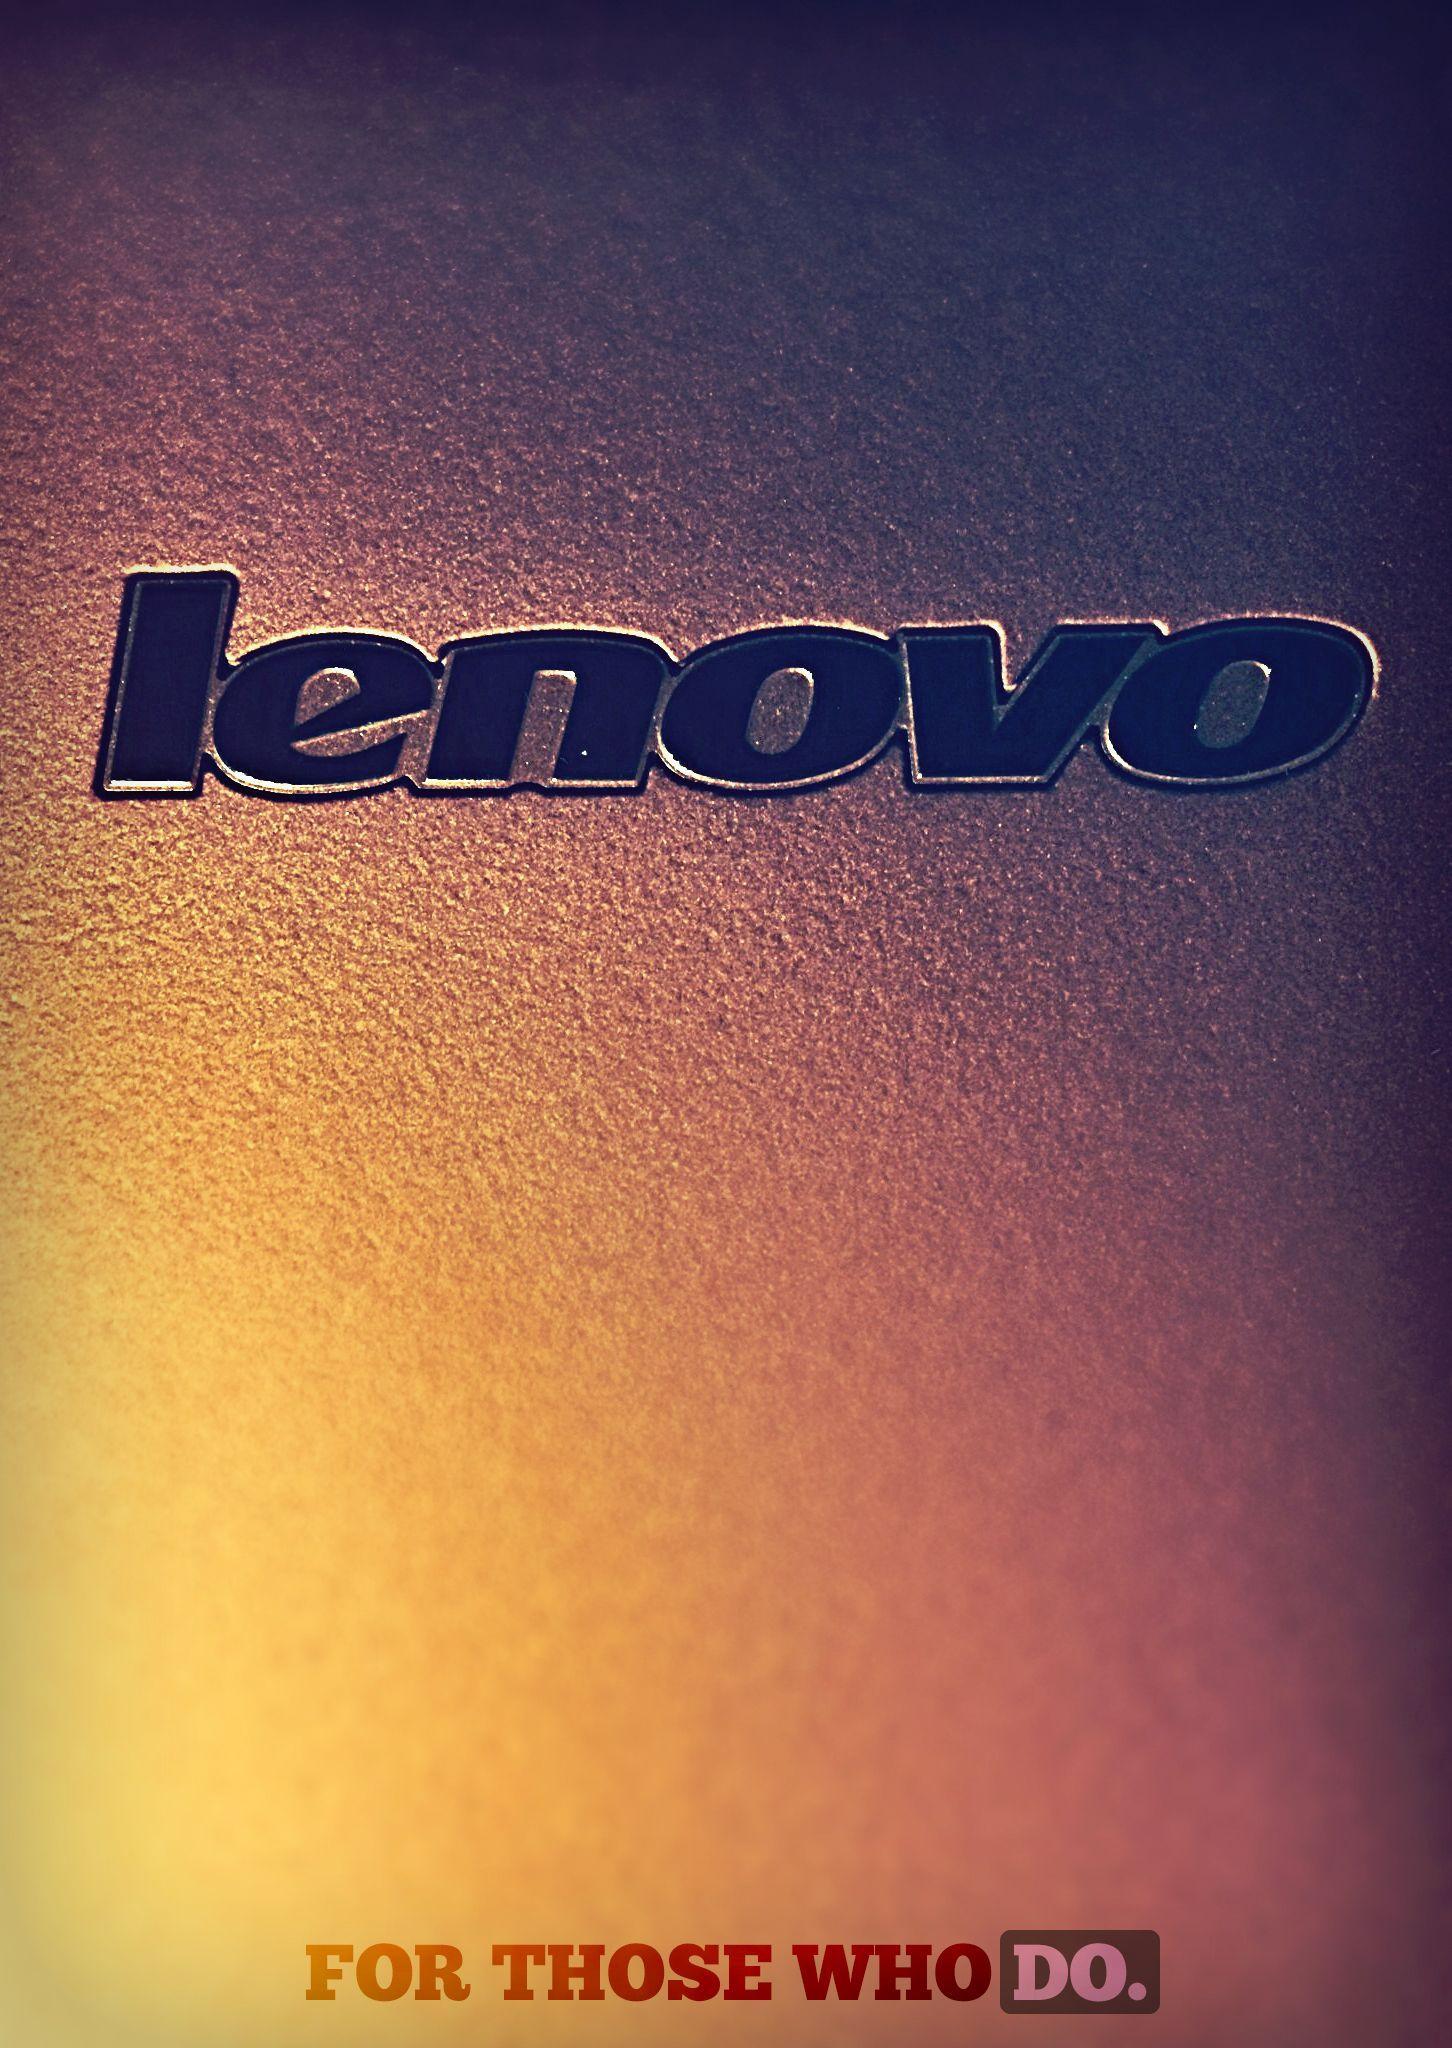 Hd Lenovo Wallpapers Wallpaper Cave